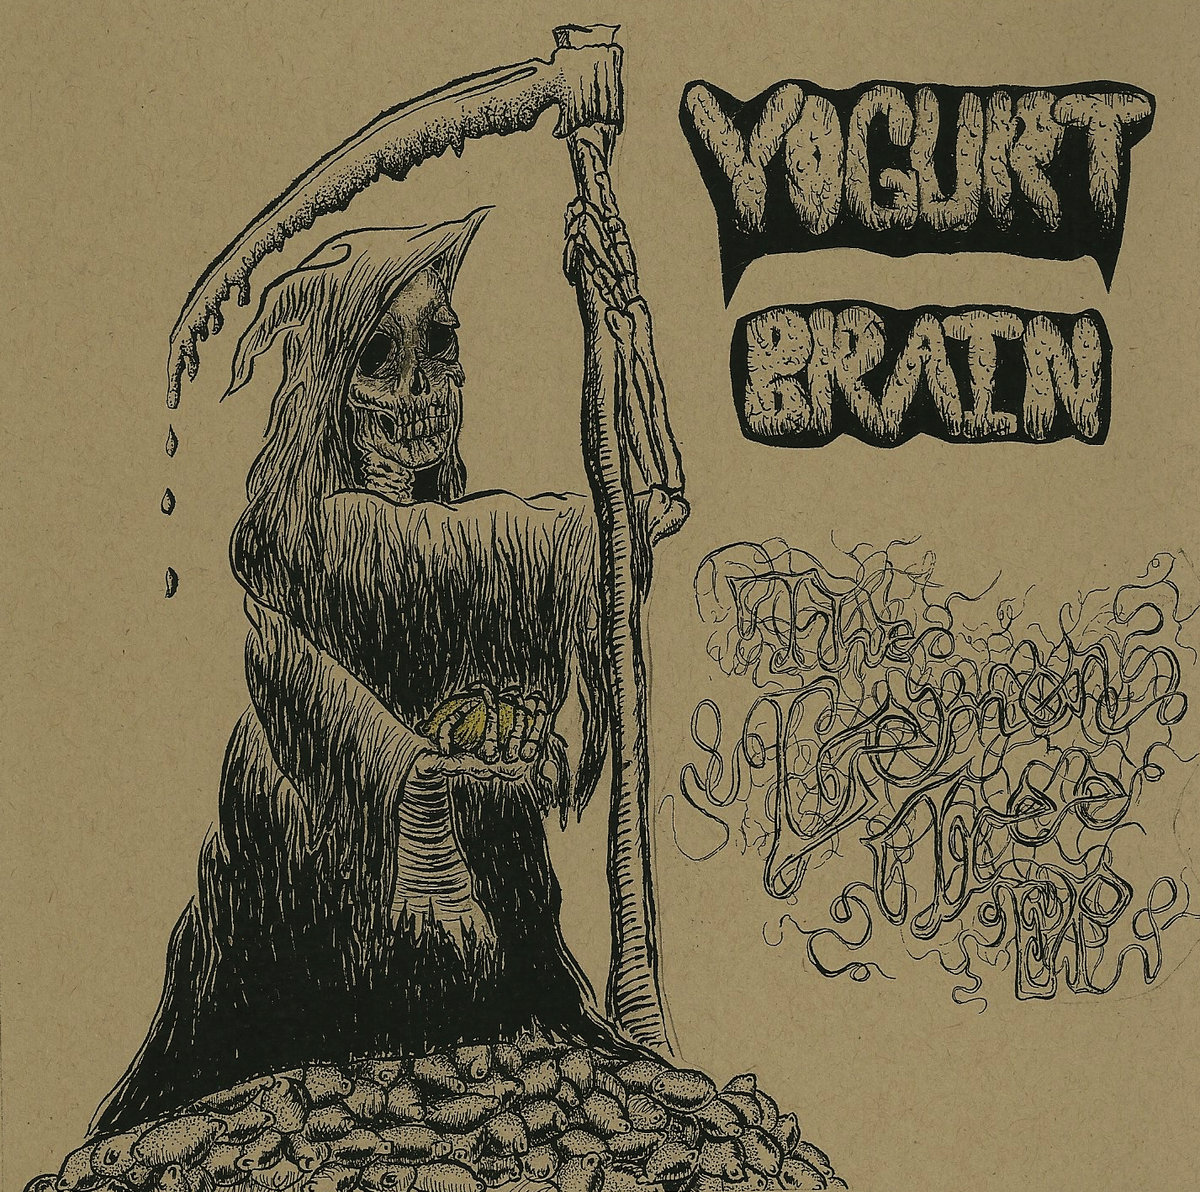 The Lemon Tree EP | Yogurt Brain